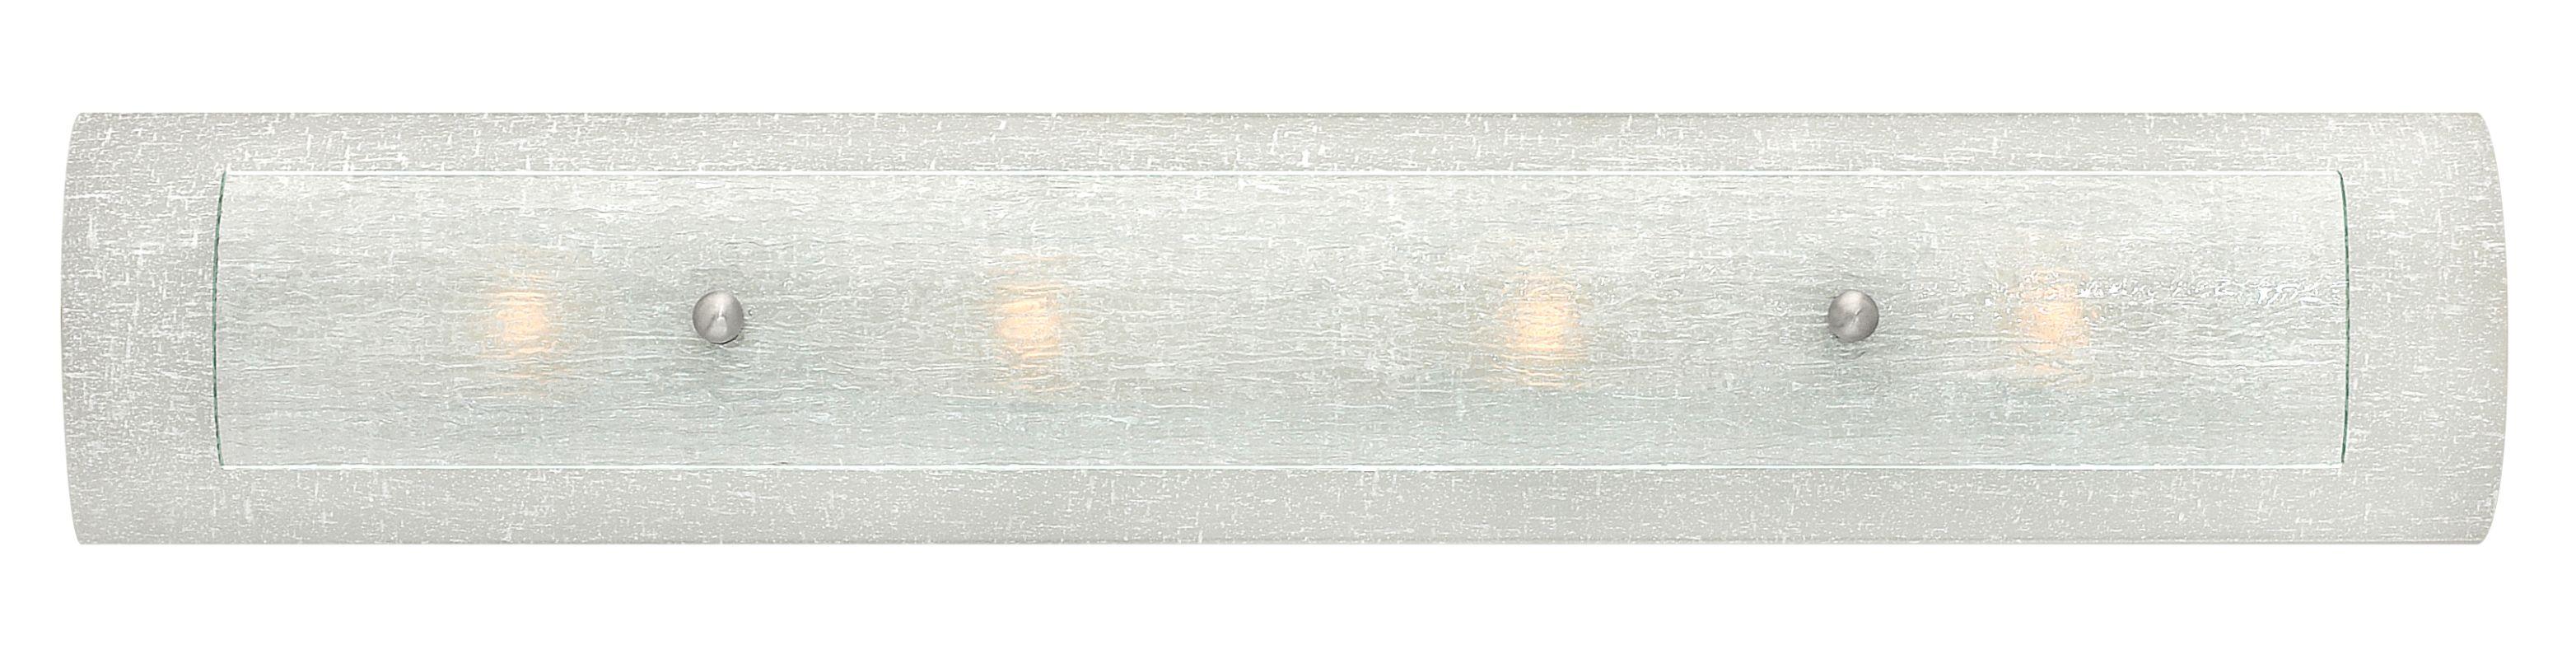 Hinkley 5614BN Brushed Nickel Contemporary Duet Bathroom Light